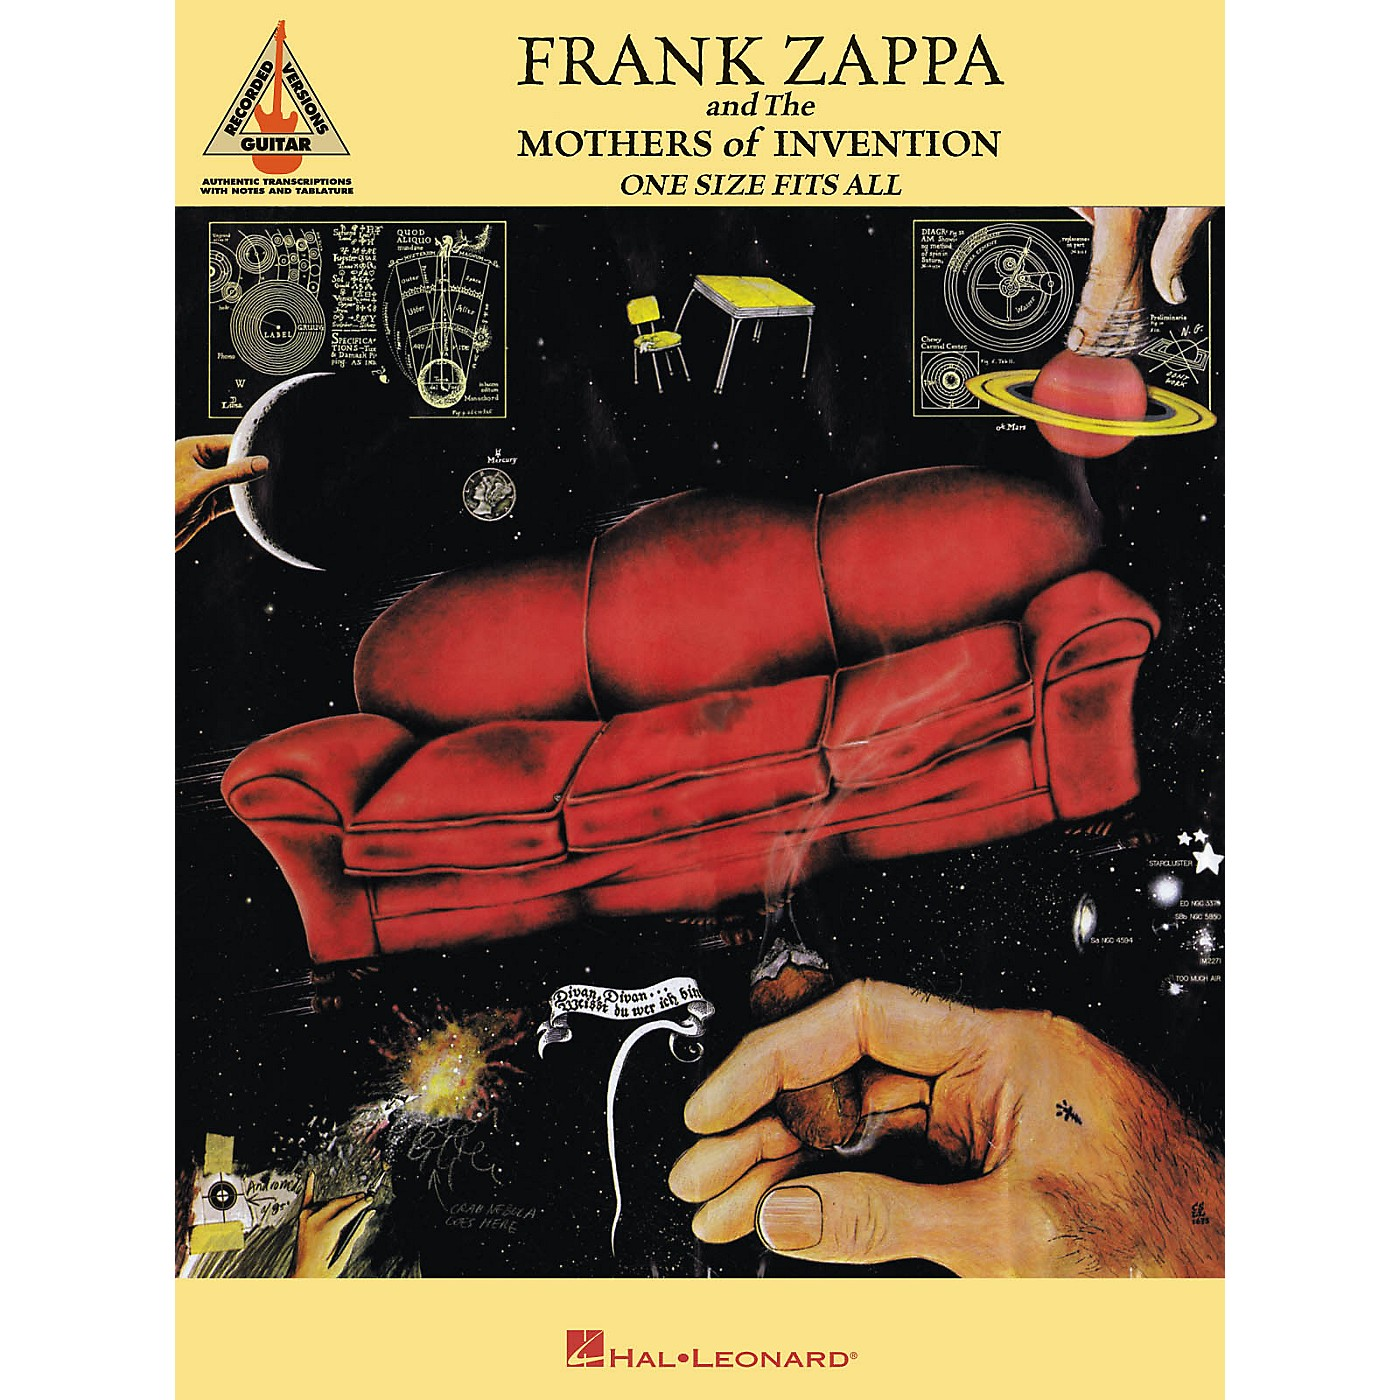 Hal Leonard Frank Zappa One Size Fits All thumbnail